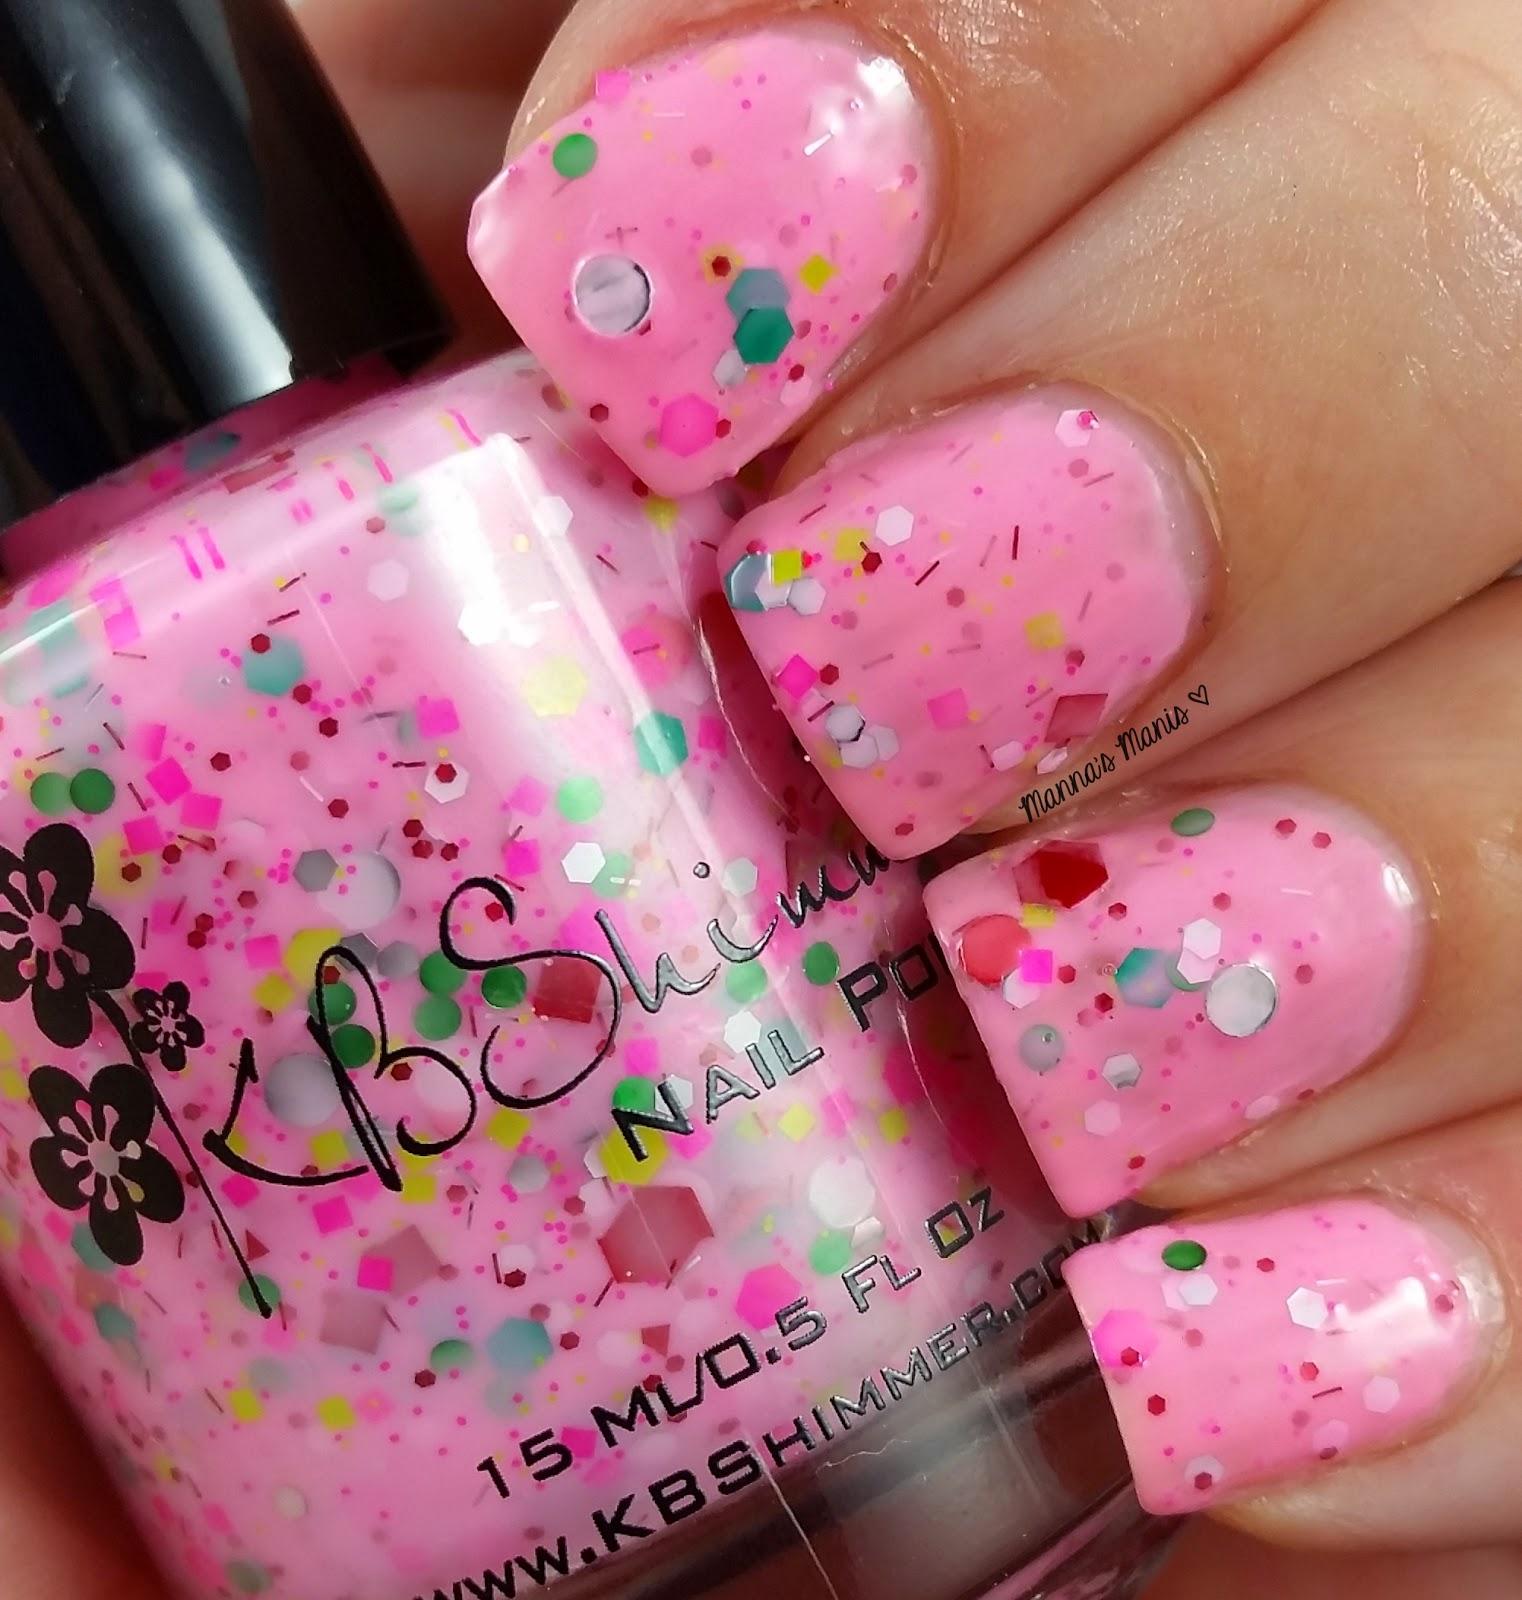 kbshimmer merry pinkmas, a bubblegum pink nail polish